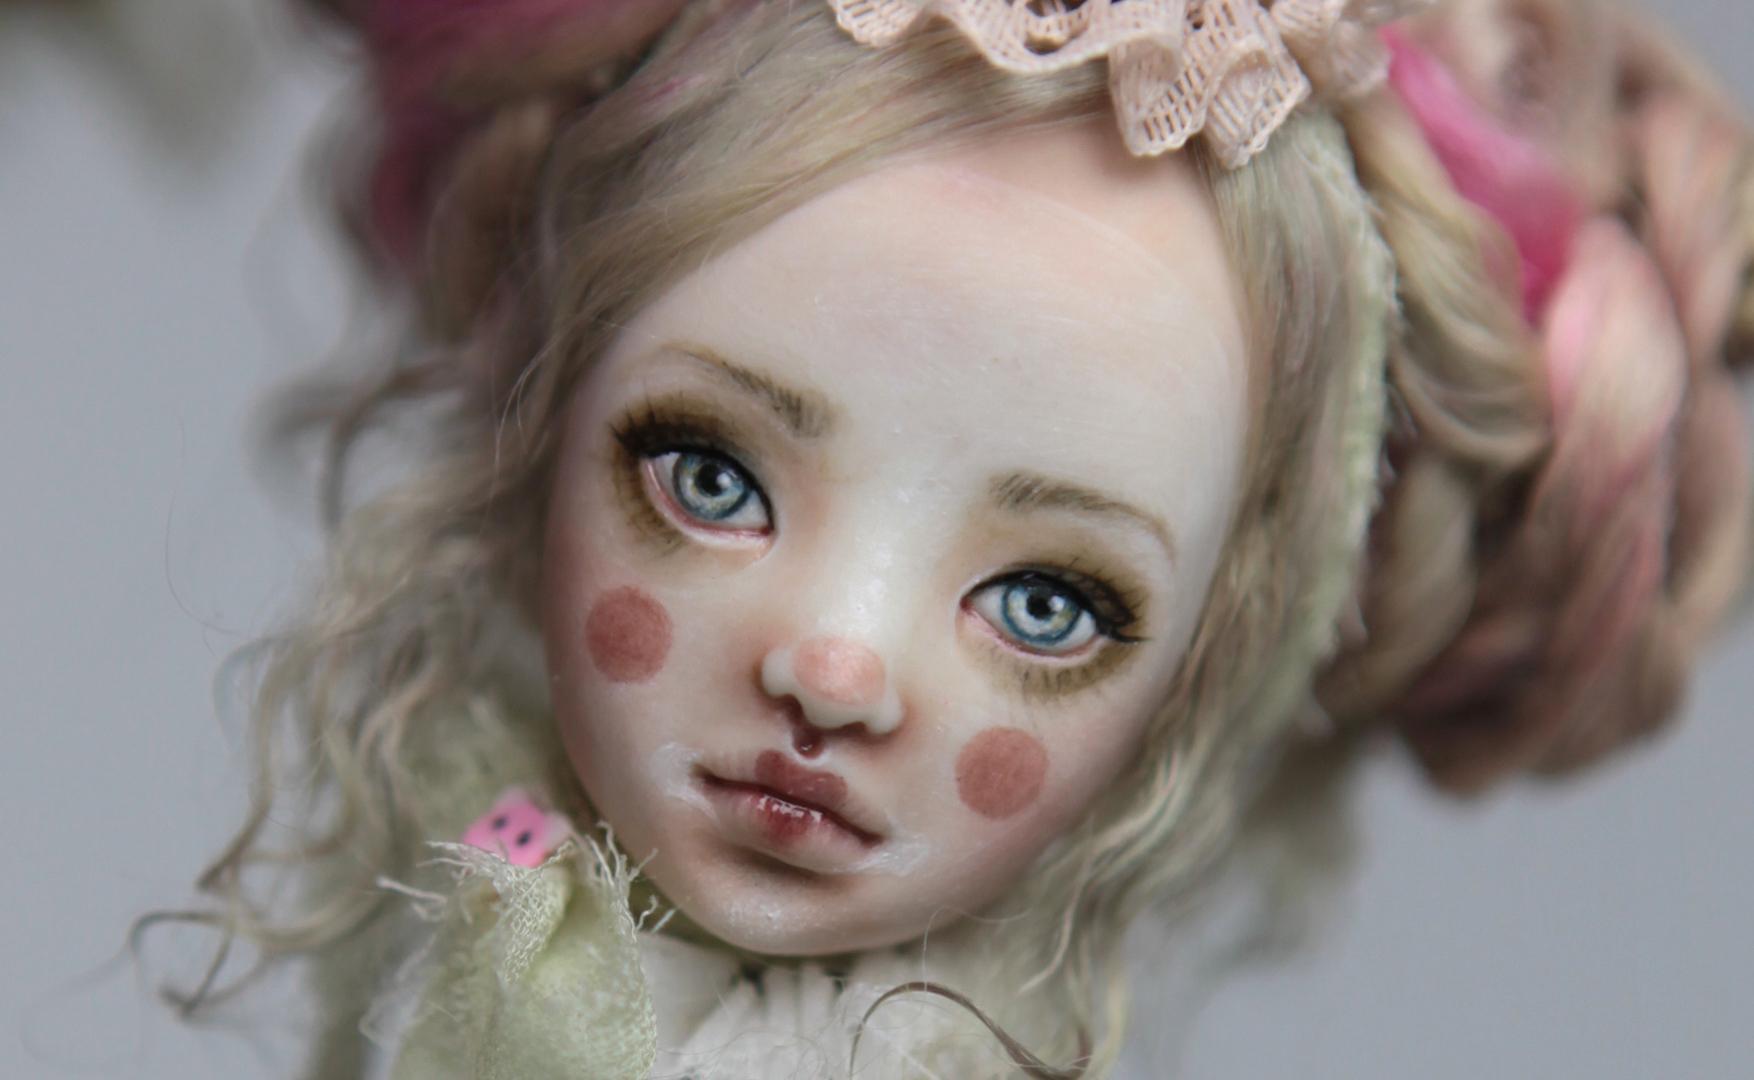 IMG 8551a 15 Victorian Roadside Circus Clown Porcelain BJD Maya